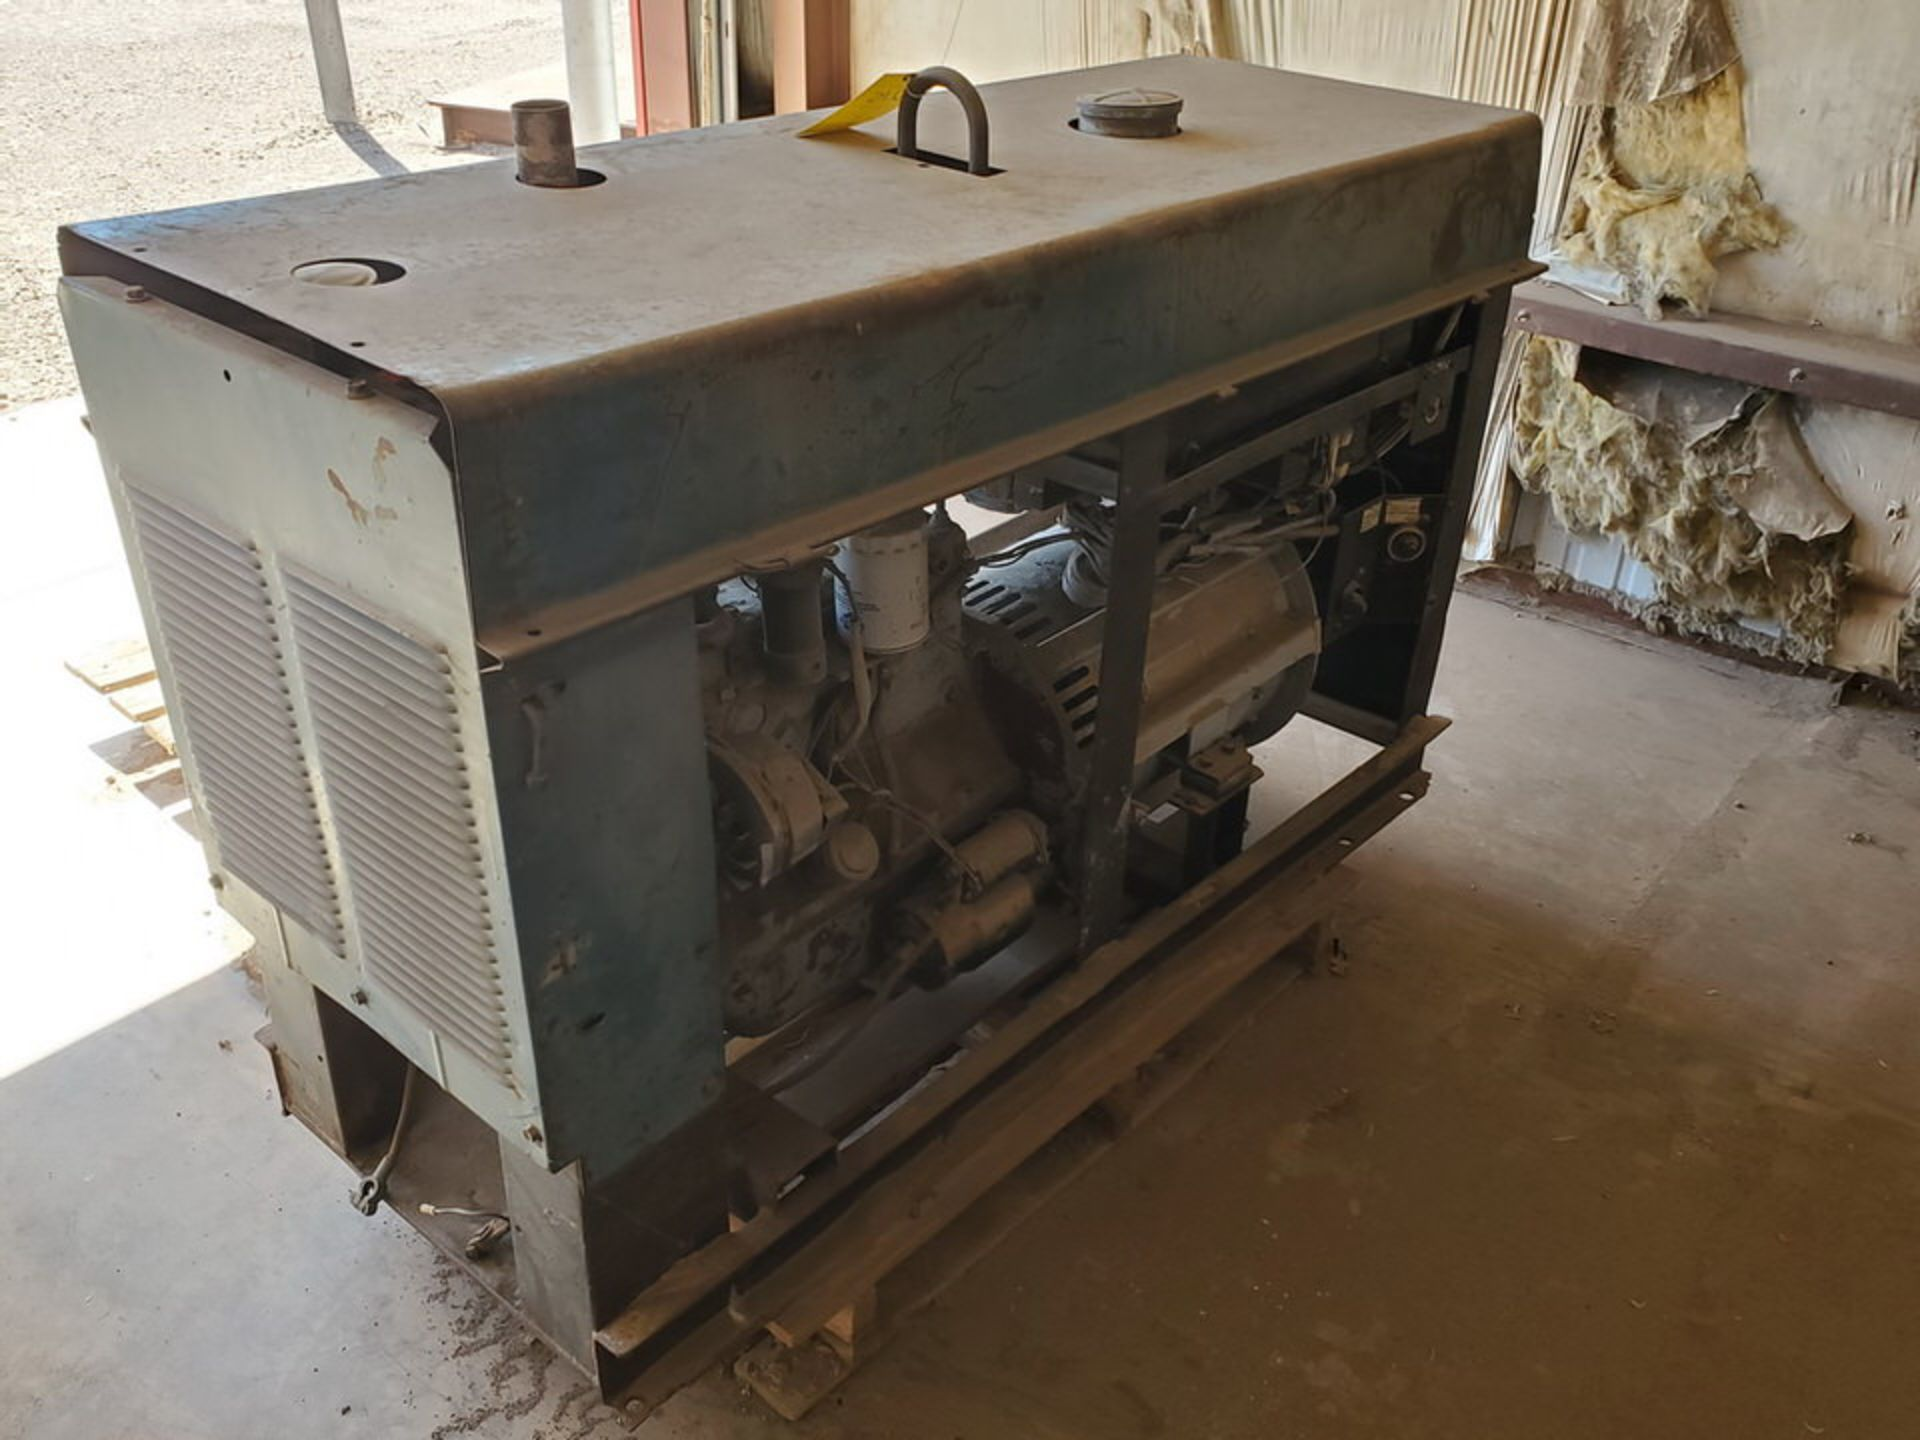 Miller Big 20 Welder Generator CC/DC: 20-750A, CC/AC: 20-575A - Image 2 of 8